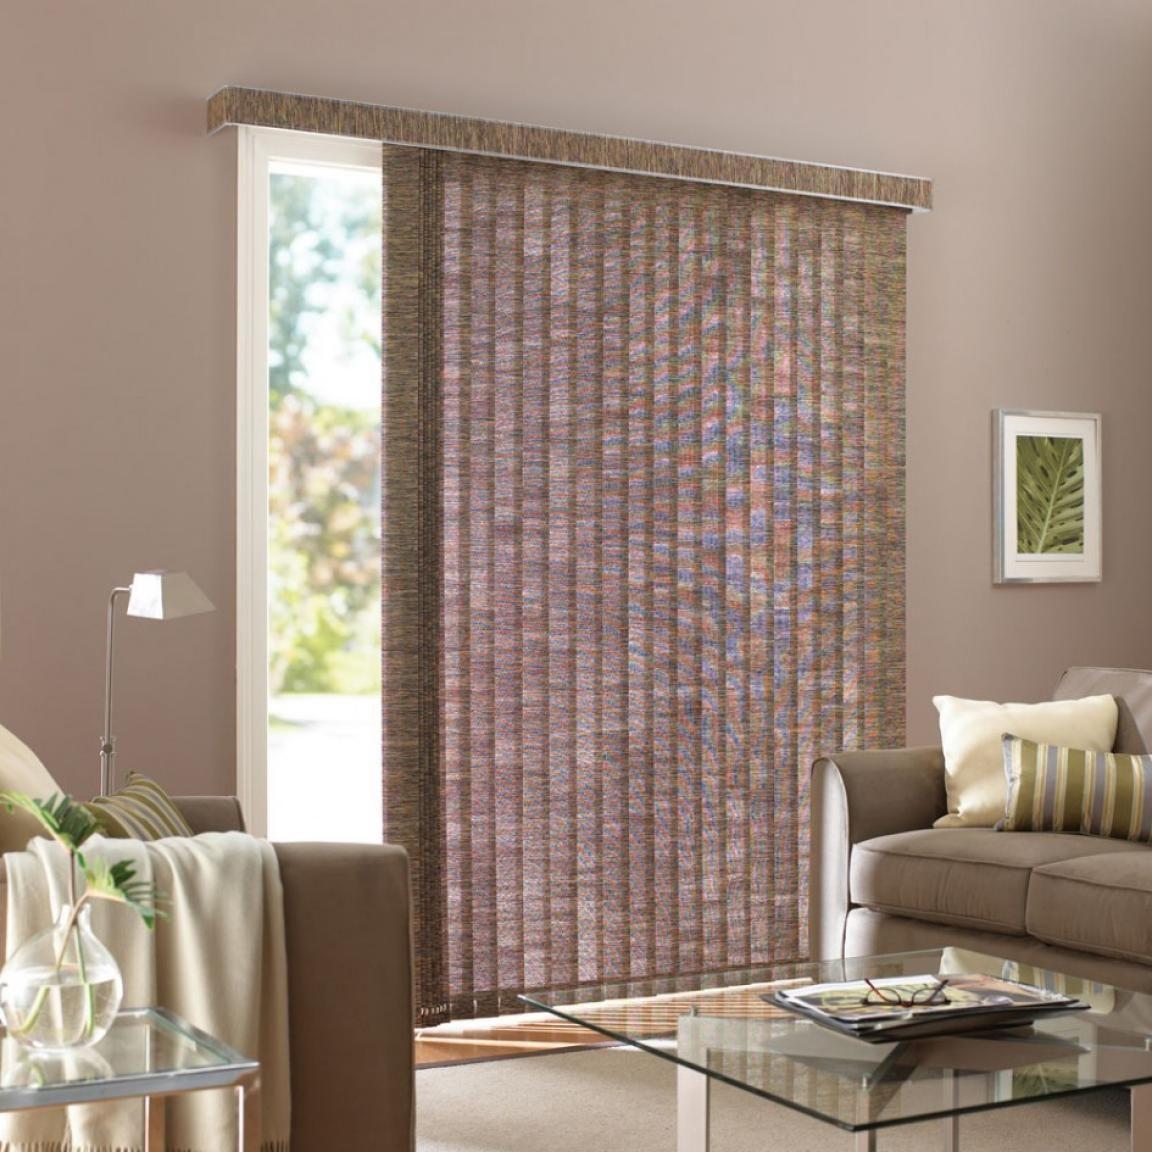 Amazing useful tips bedroom blinds basements sheer blinds texture